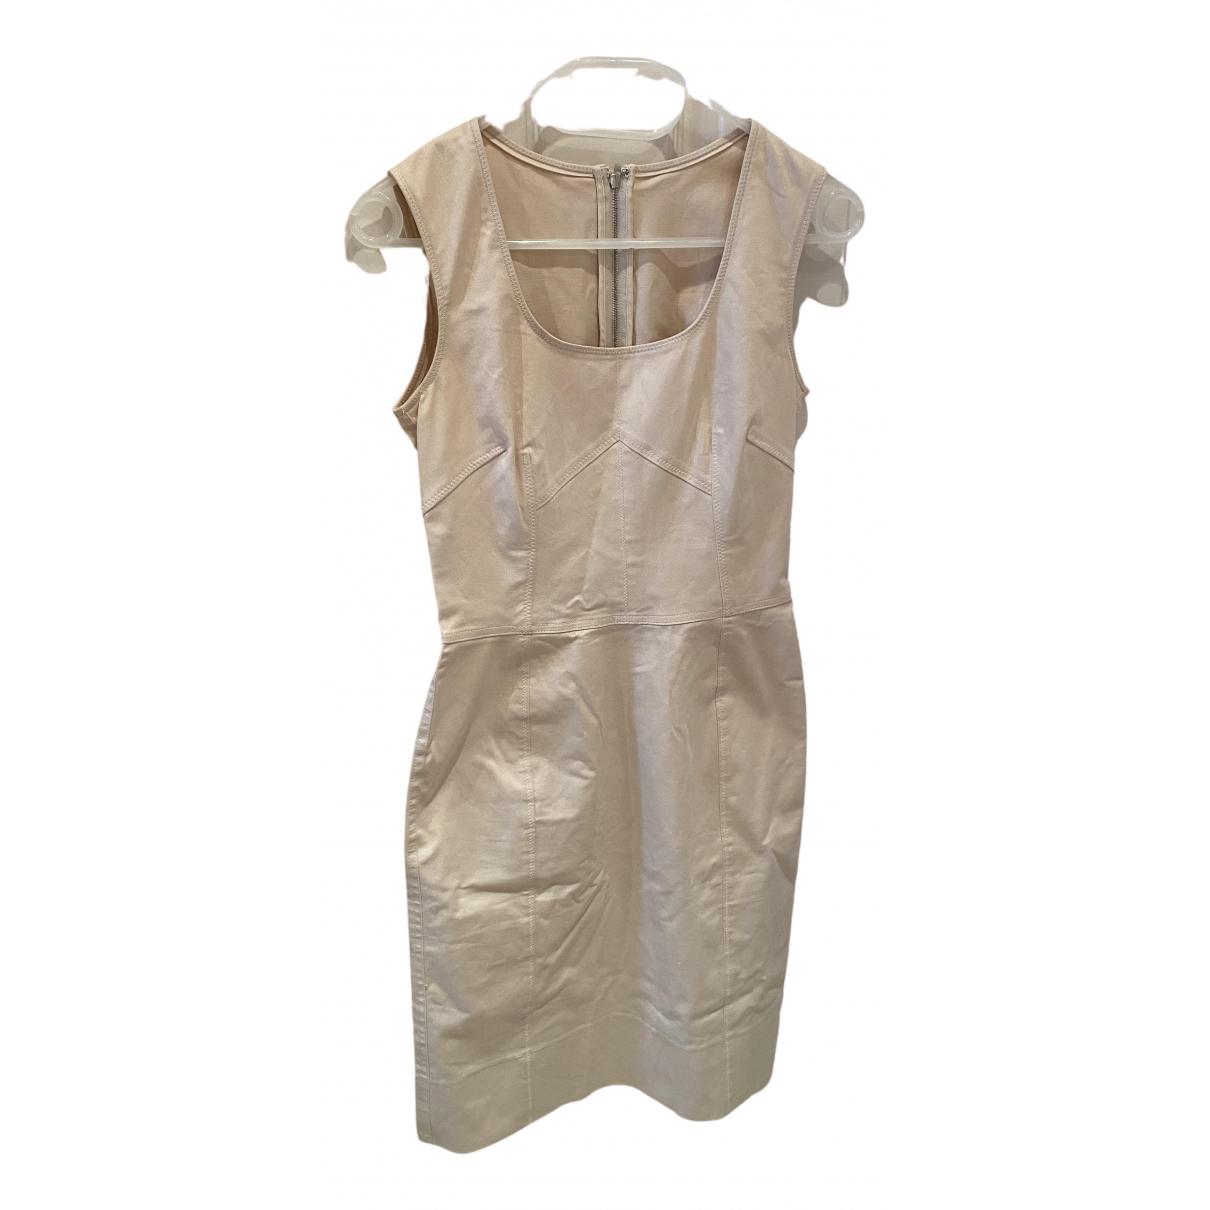 Dolce & Gabbana \N Beige Cotton dress for Women 40 FR